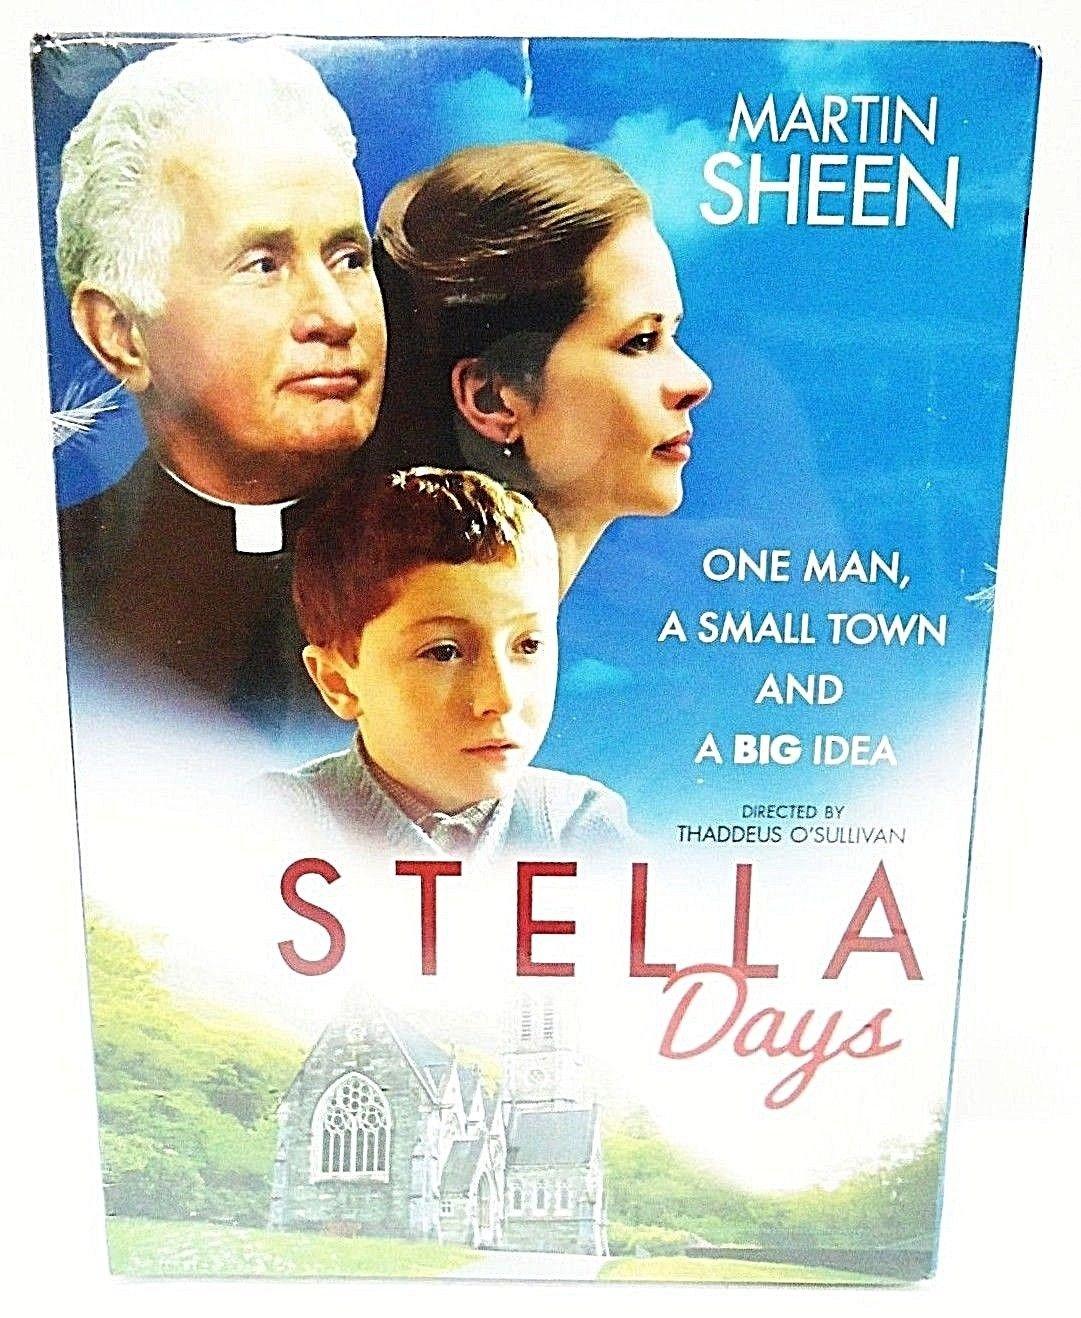 STELLA DAYS - DVD - MARTIN SHEEN - NEW - SEALED - IRELAND - RELIGION - MOVIE